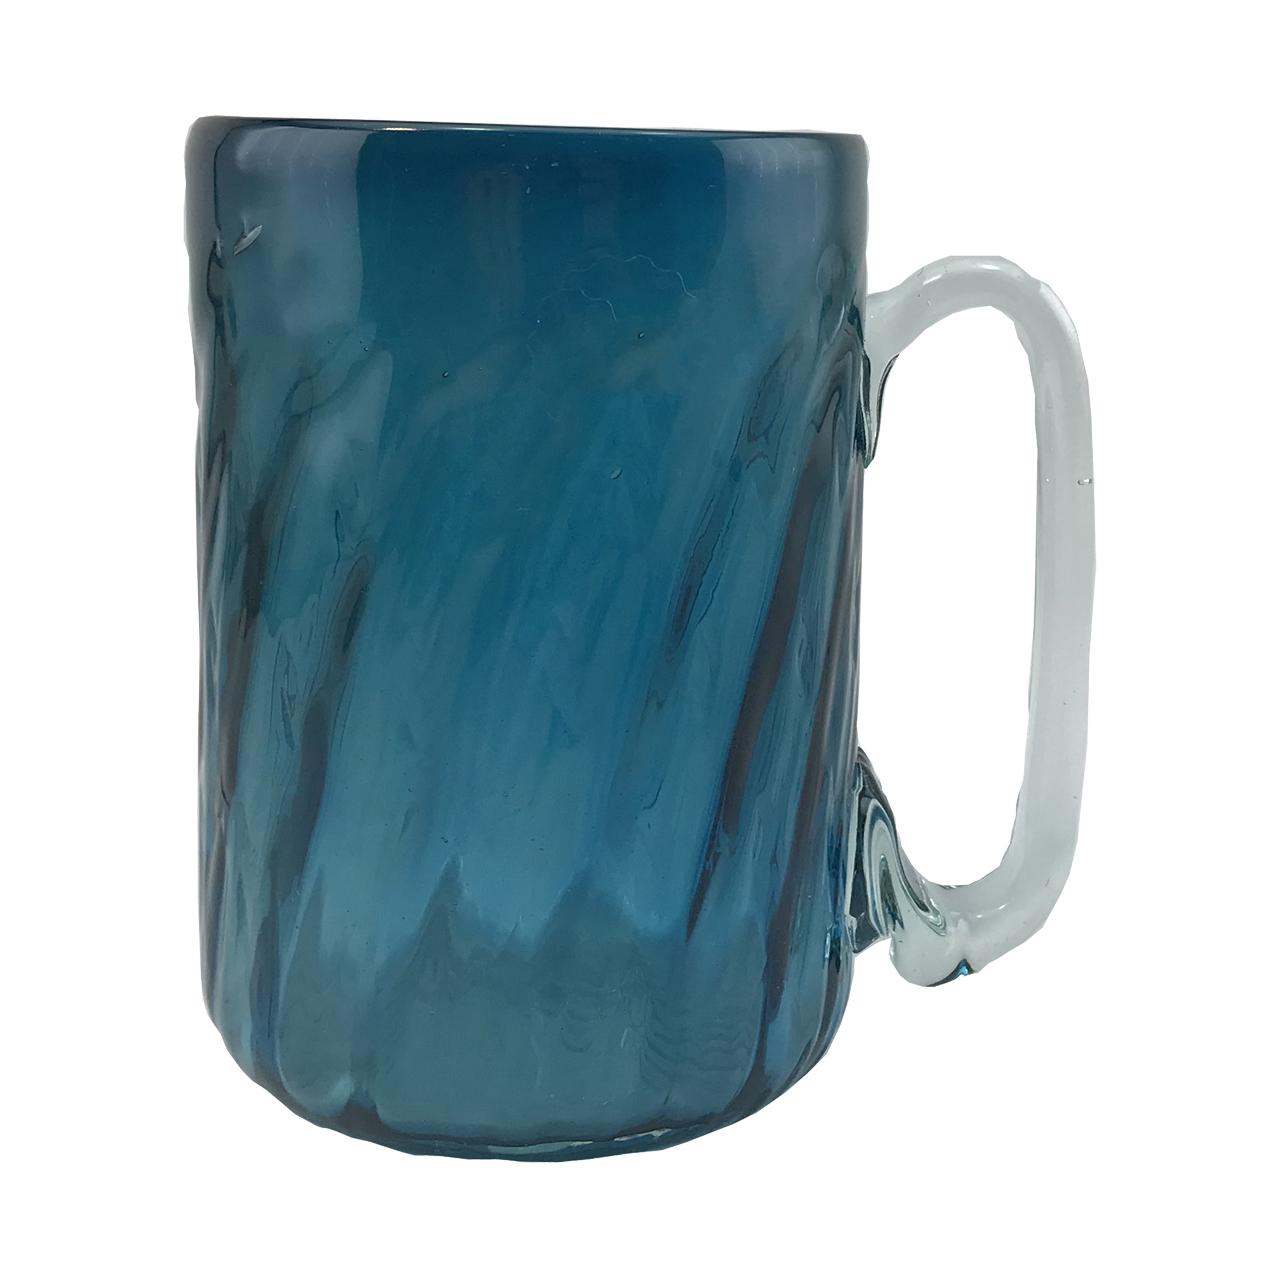 لیوان شیشه ای کد 110